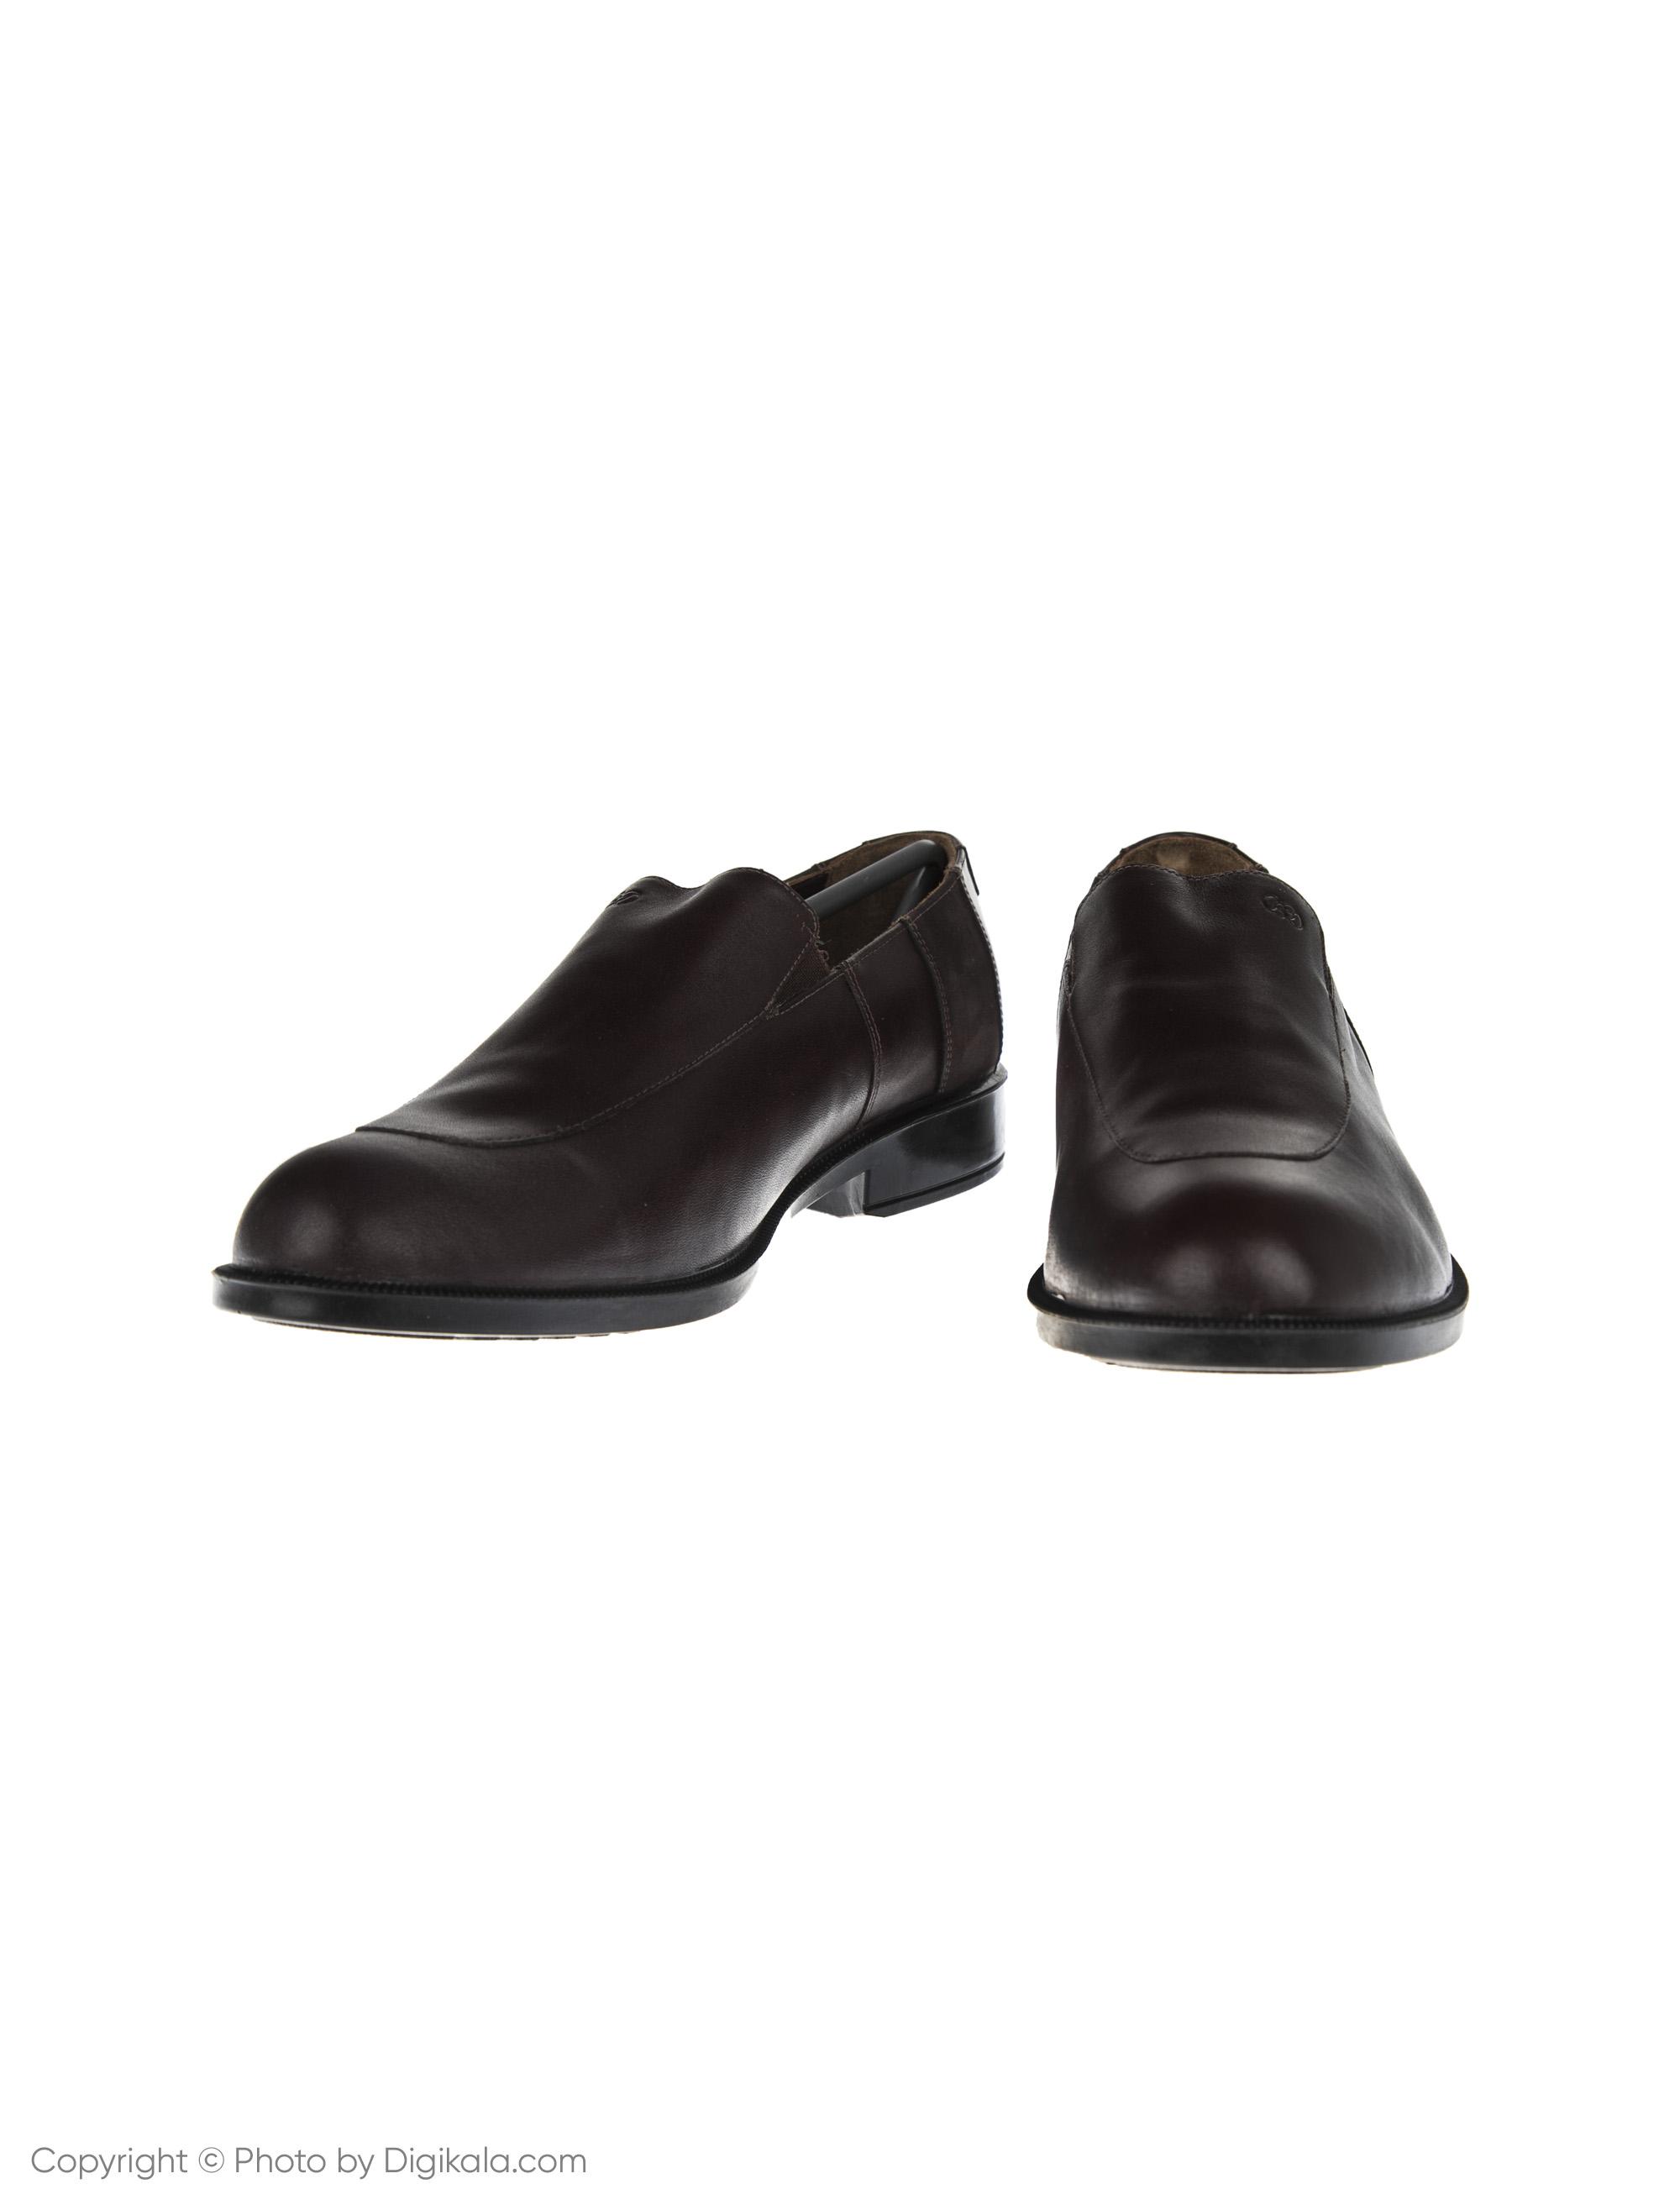 کفش مردانه دنیلی مدل 209110136019